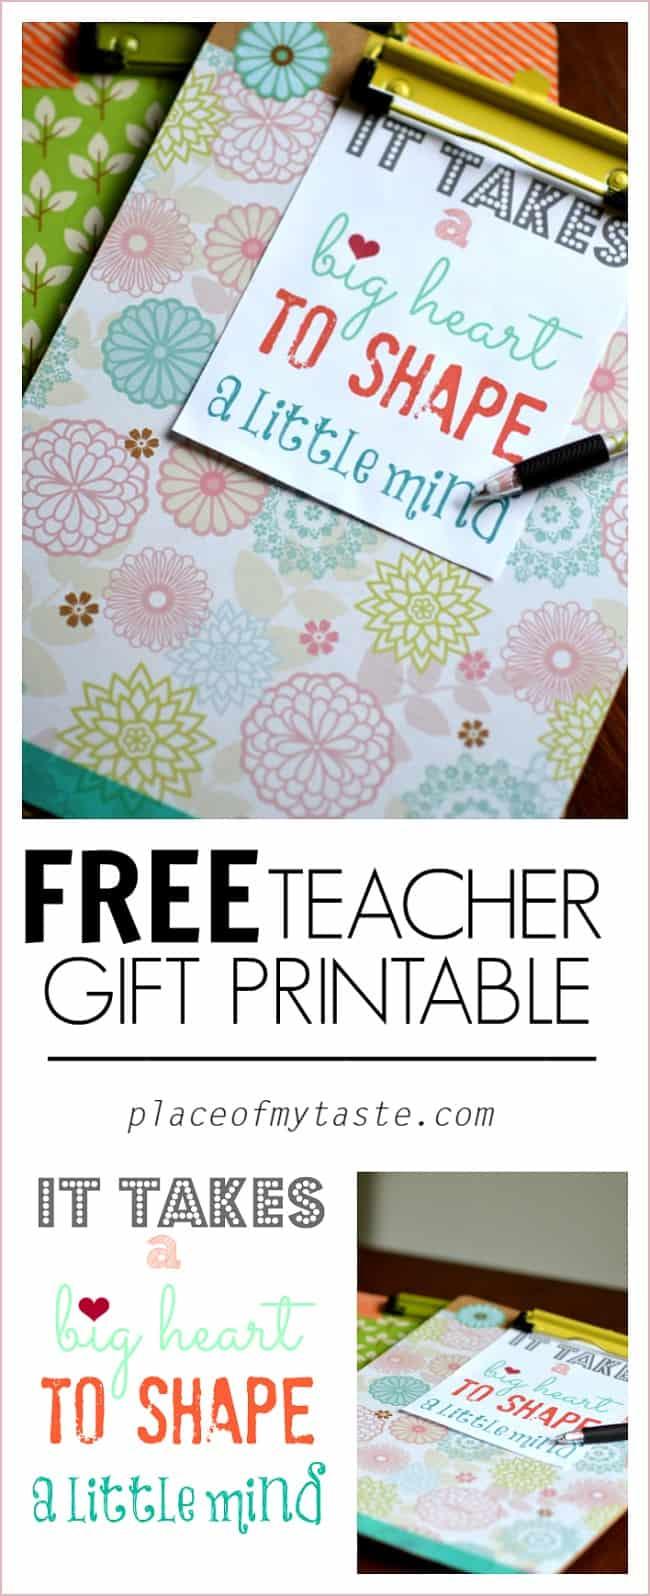 Teacher gift printable